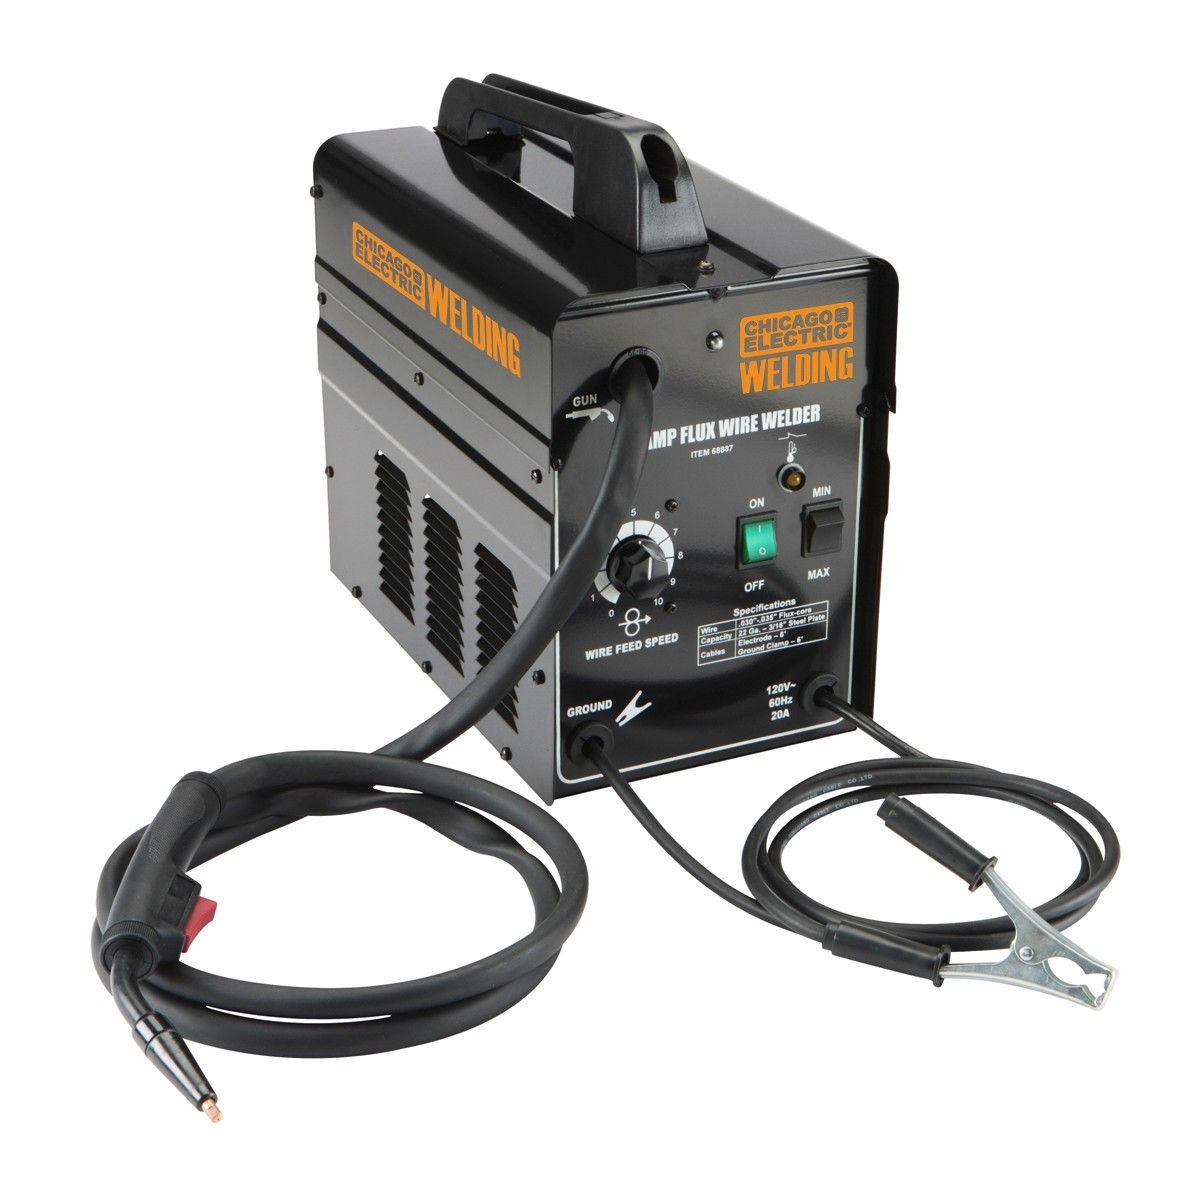 89 99 chicago electric welding 68887 90 amp flux wire welder black 89 99 chicago electric [ 1200 x 1200 Pixel ]